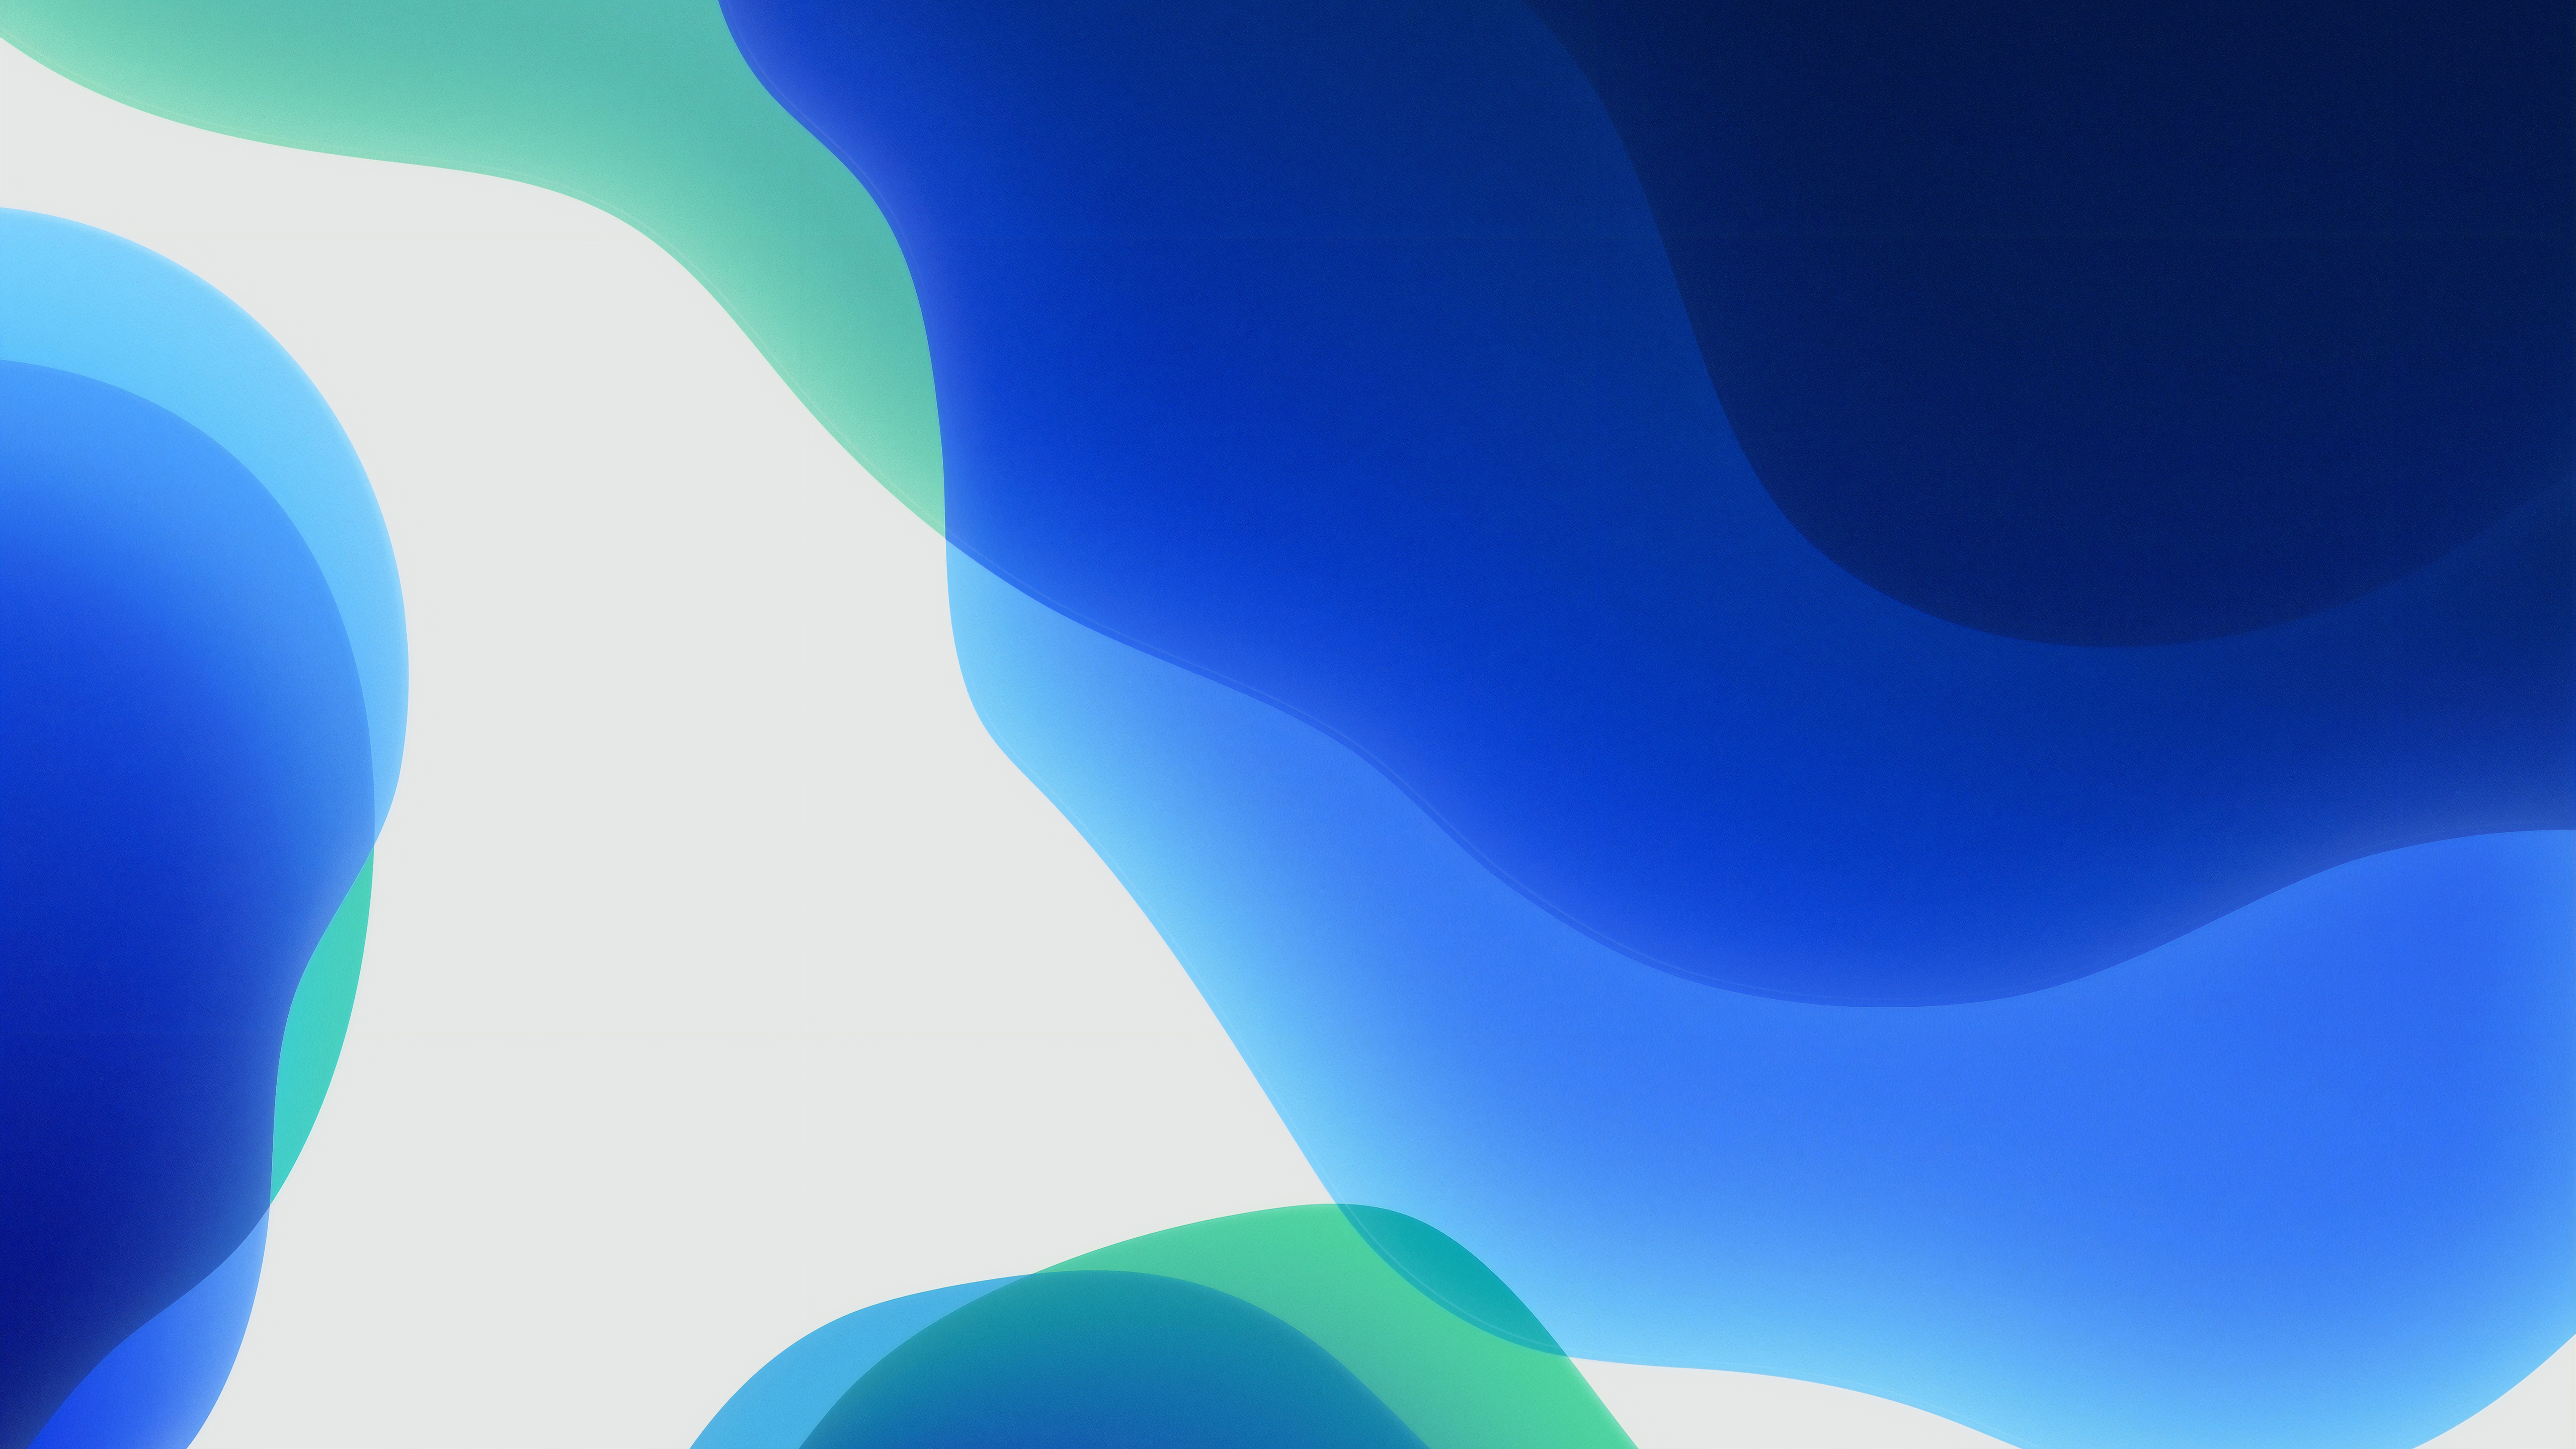 Ios 13 Wallpaper Blue Light 5k Retina Ultra Hd обои